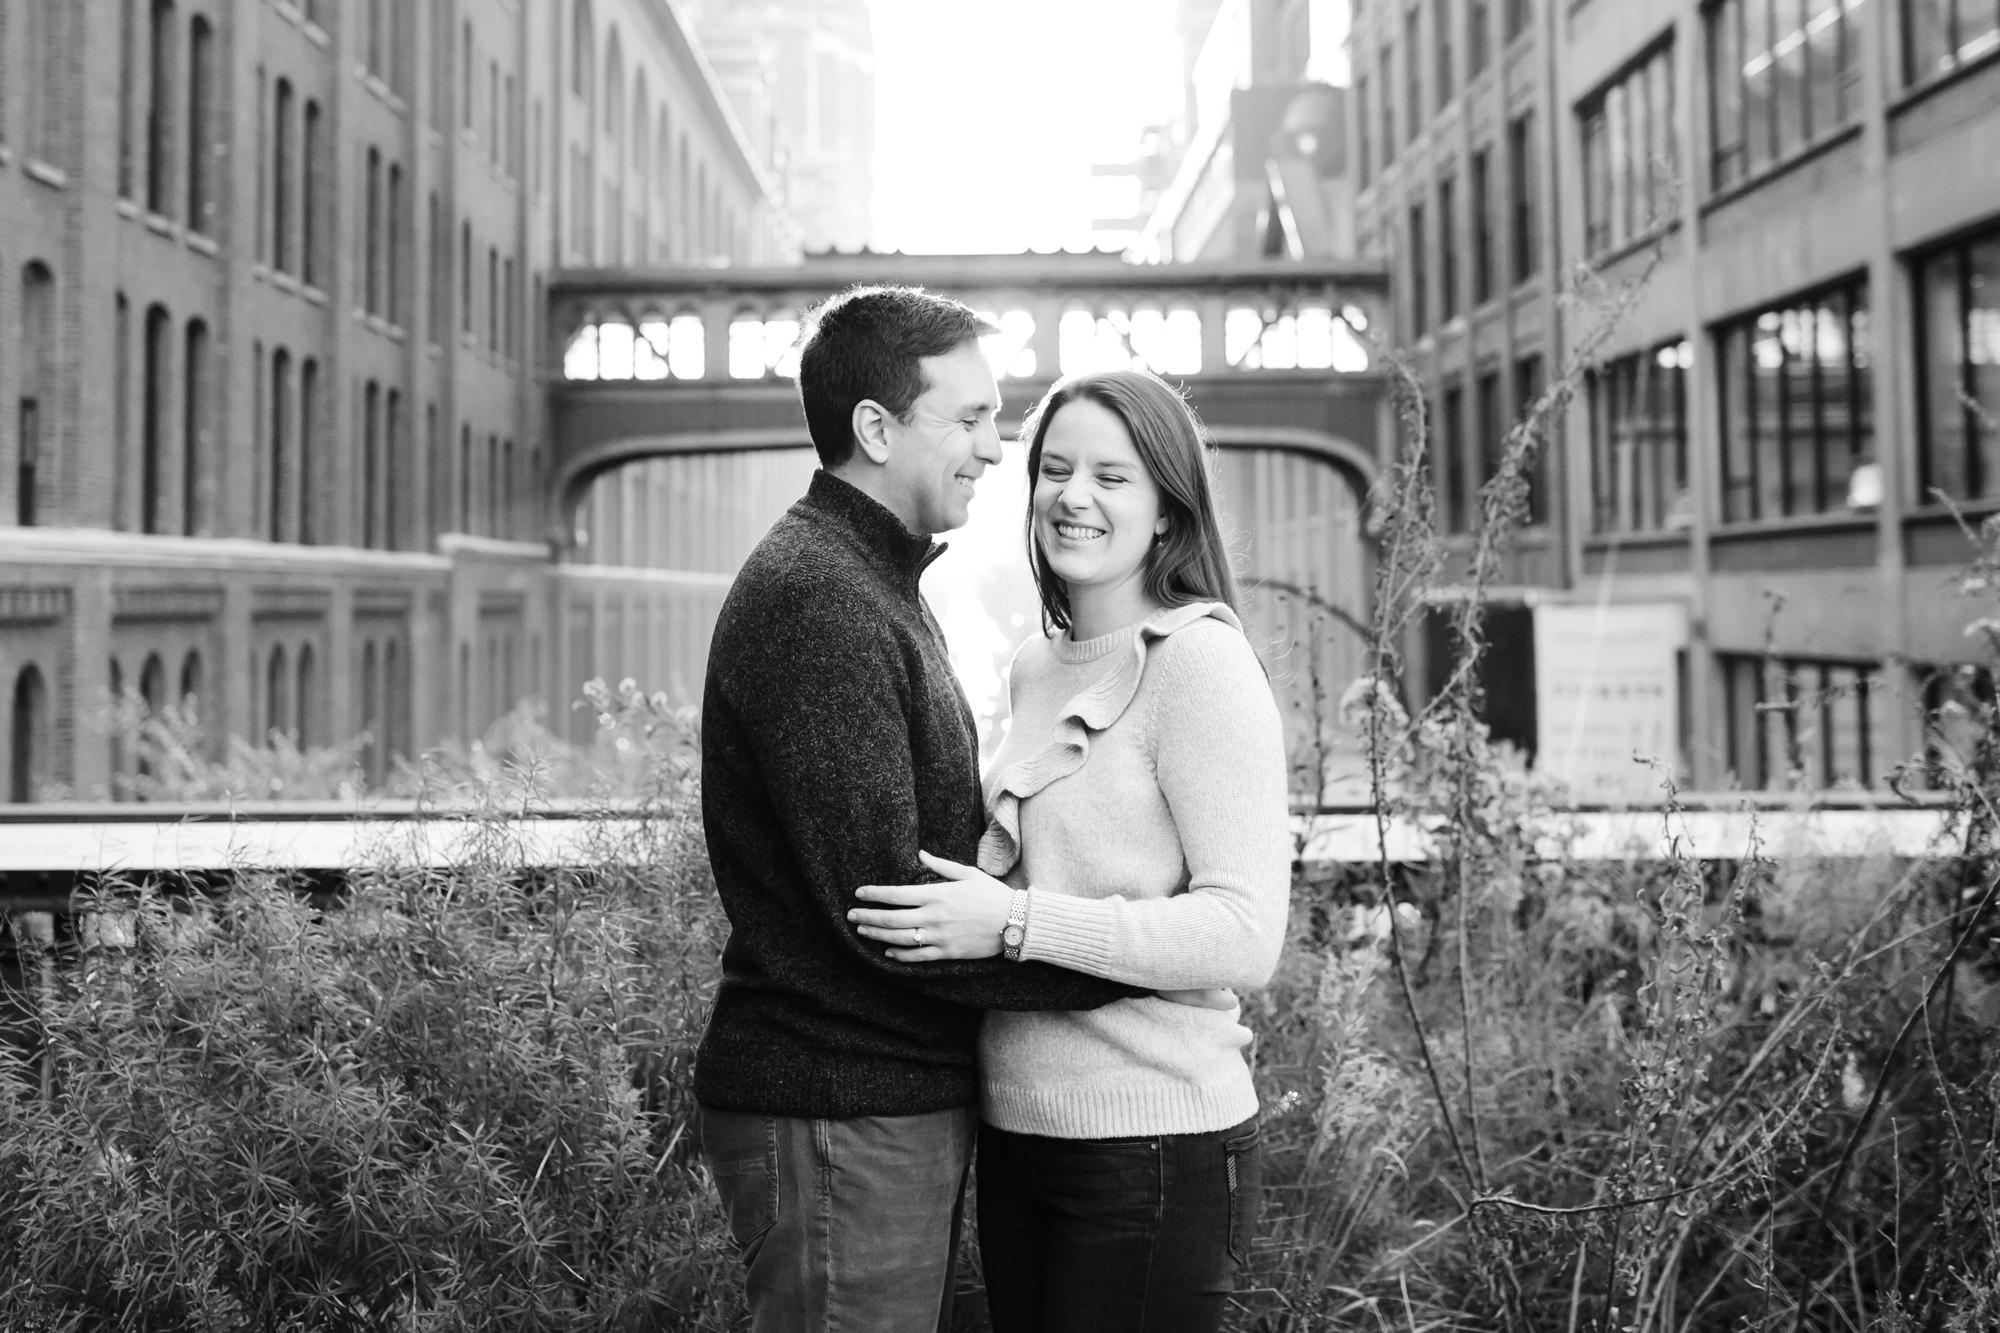 05_Sarah_Rob_The_Highline_New_York_City_Engagement_Photos_041.jpg